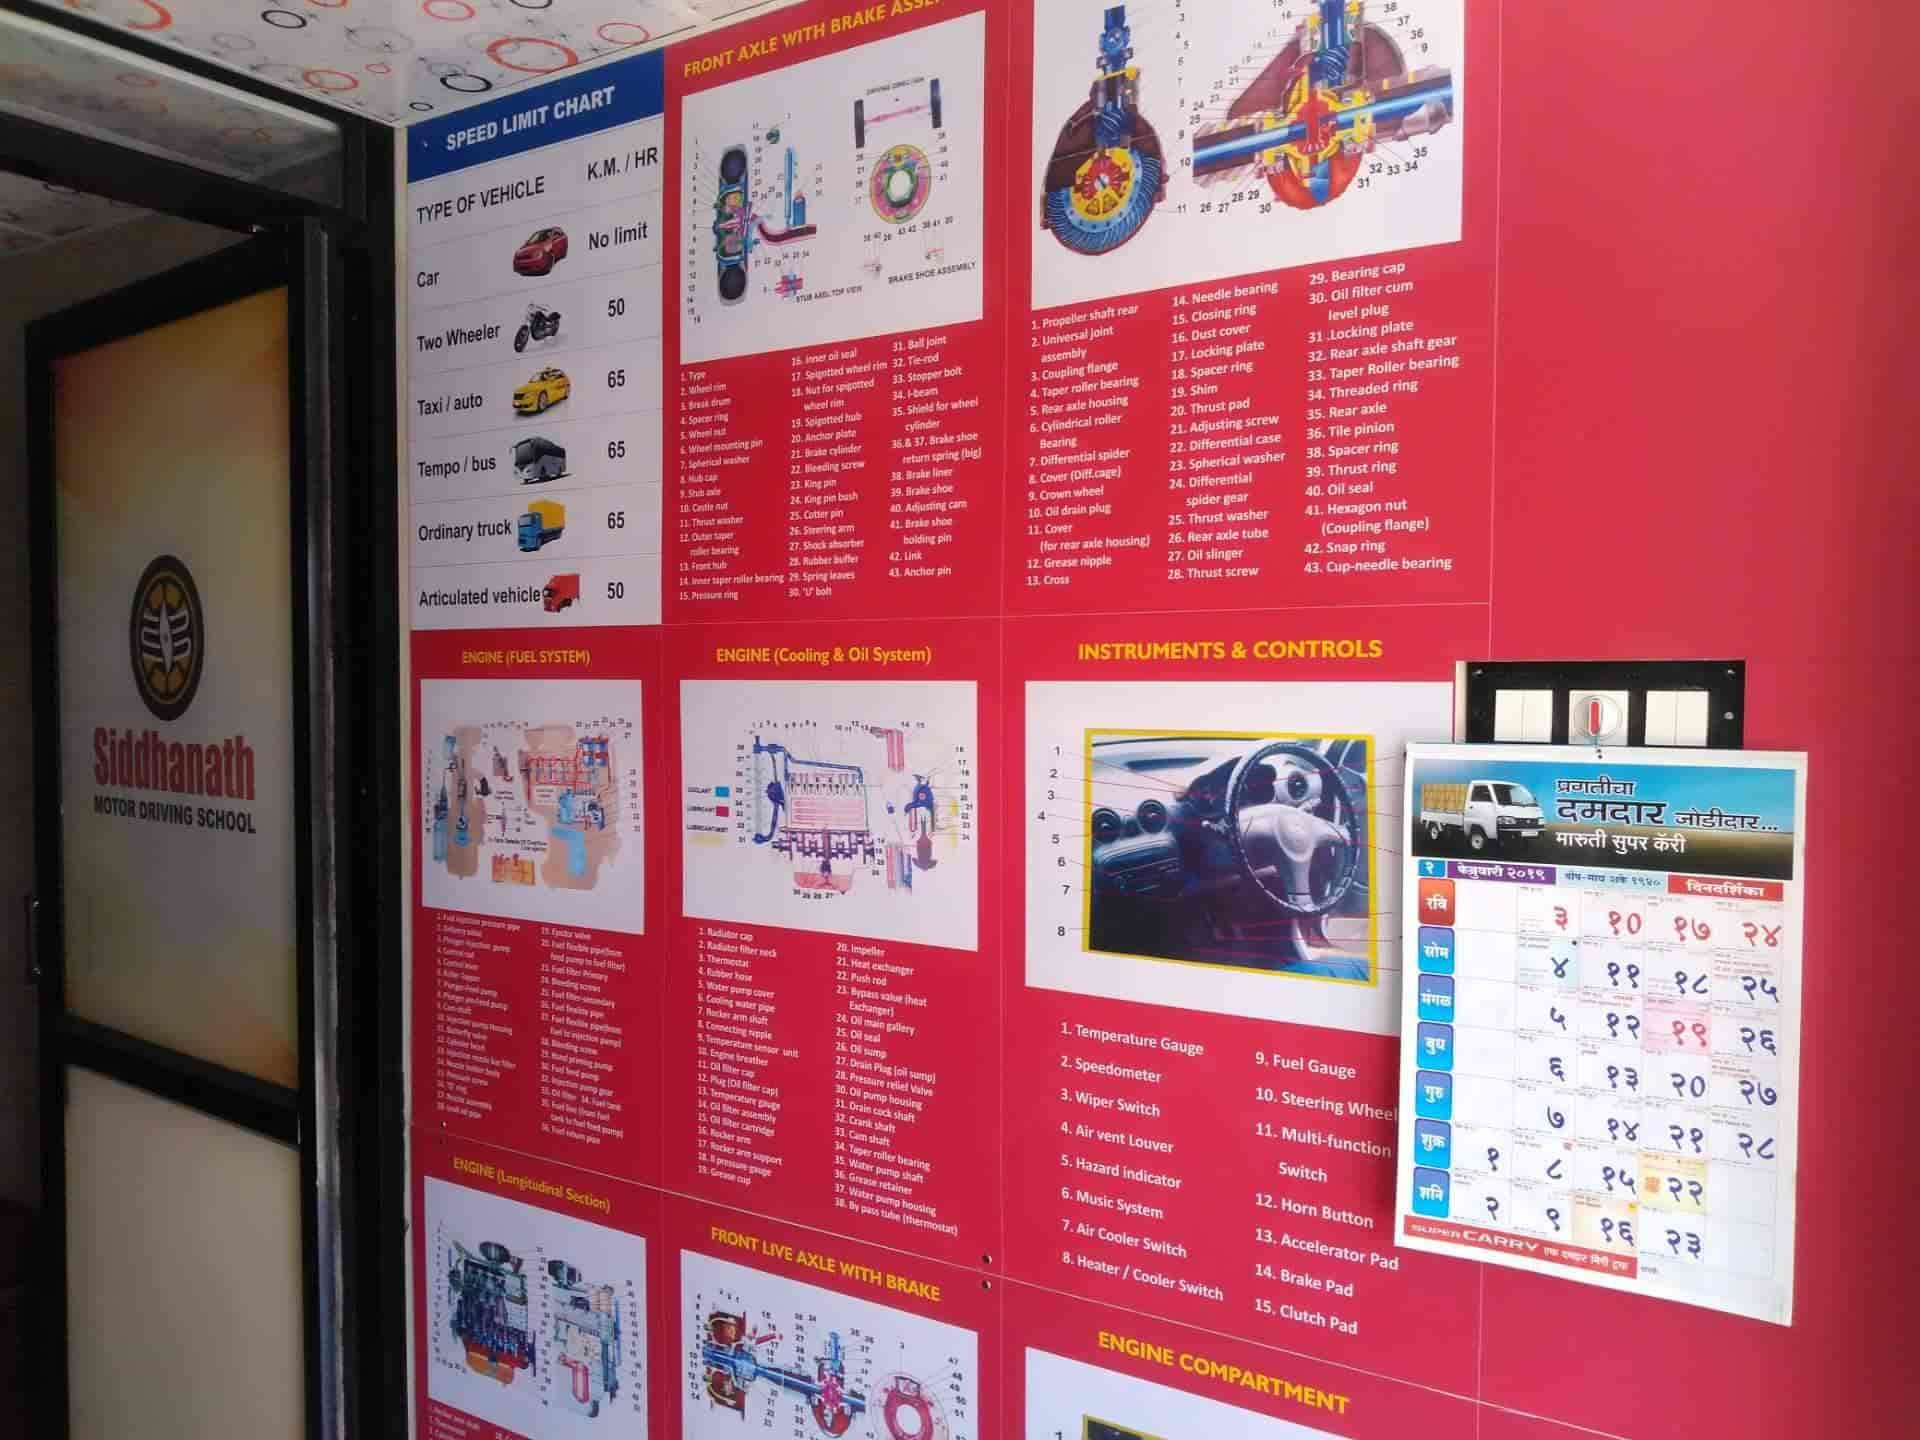 siddhanath motor driving school, lohegaon - motor training schools in pune  - justdial